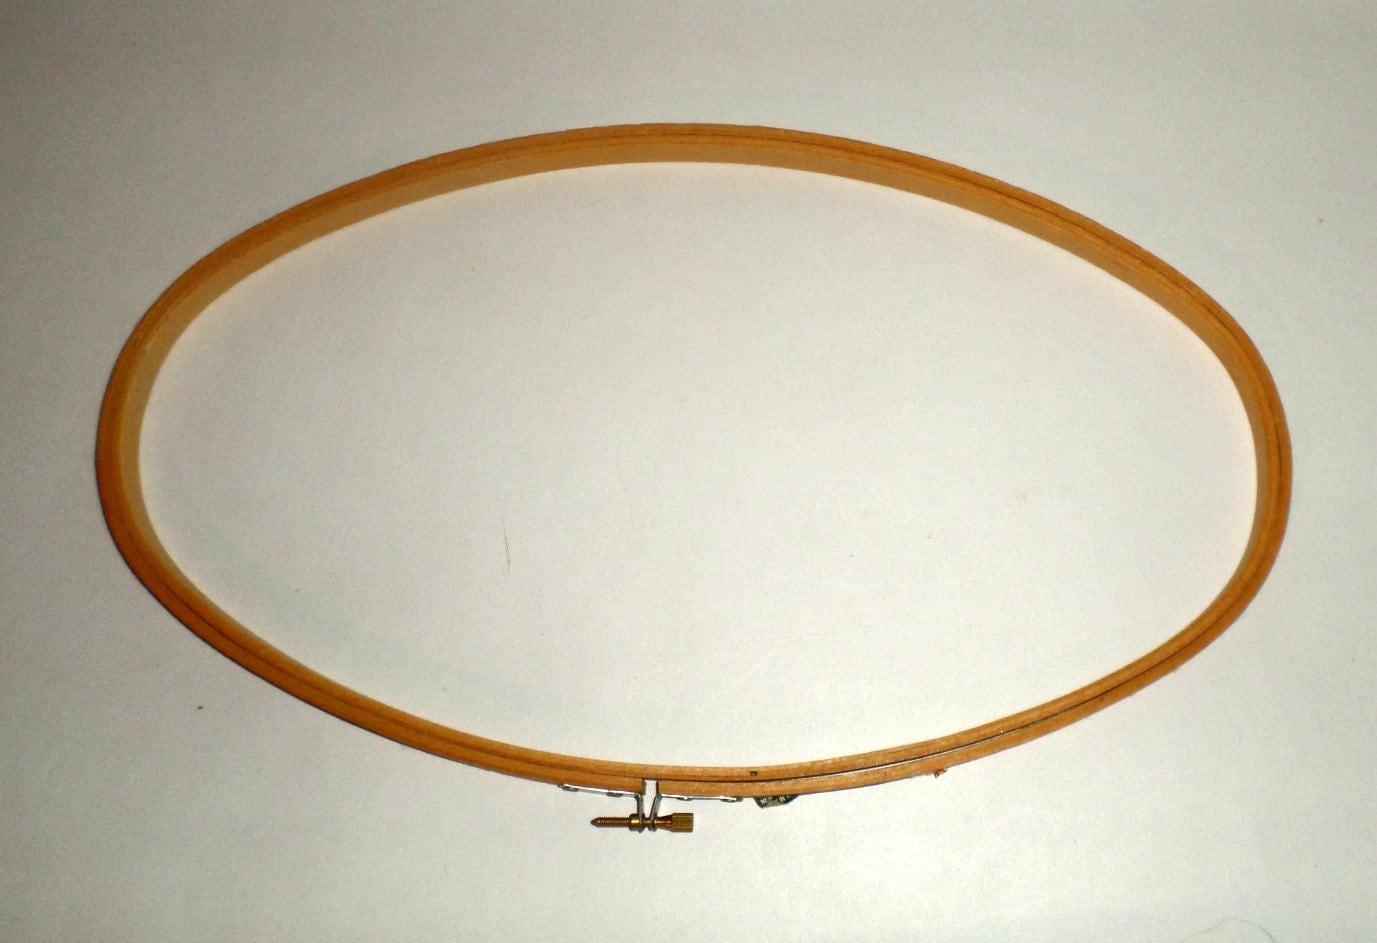 Vintage wood oval hoop wooden embroidery